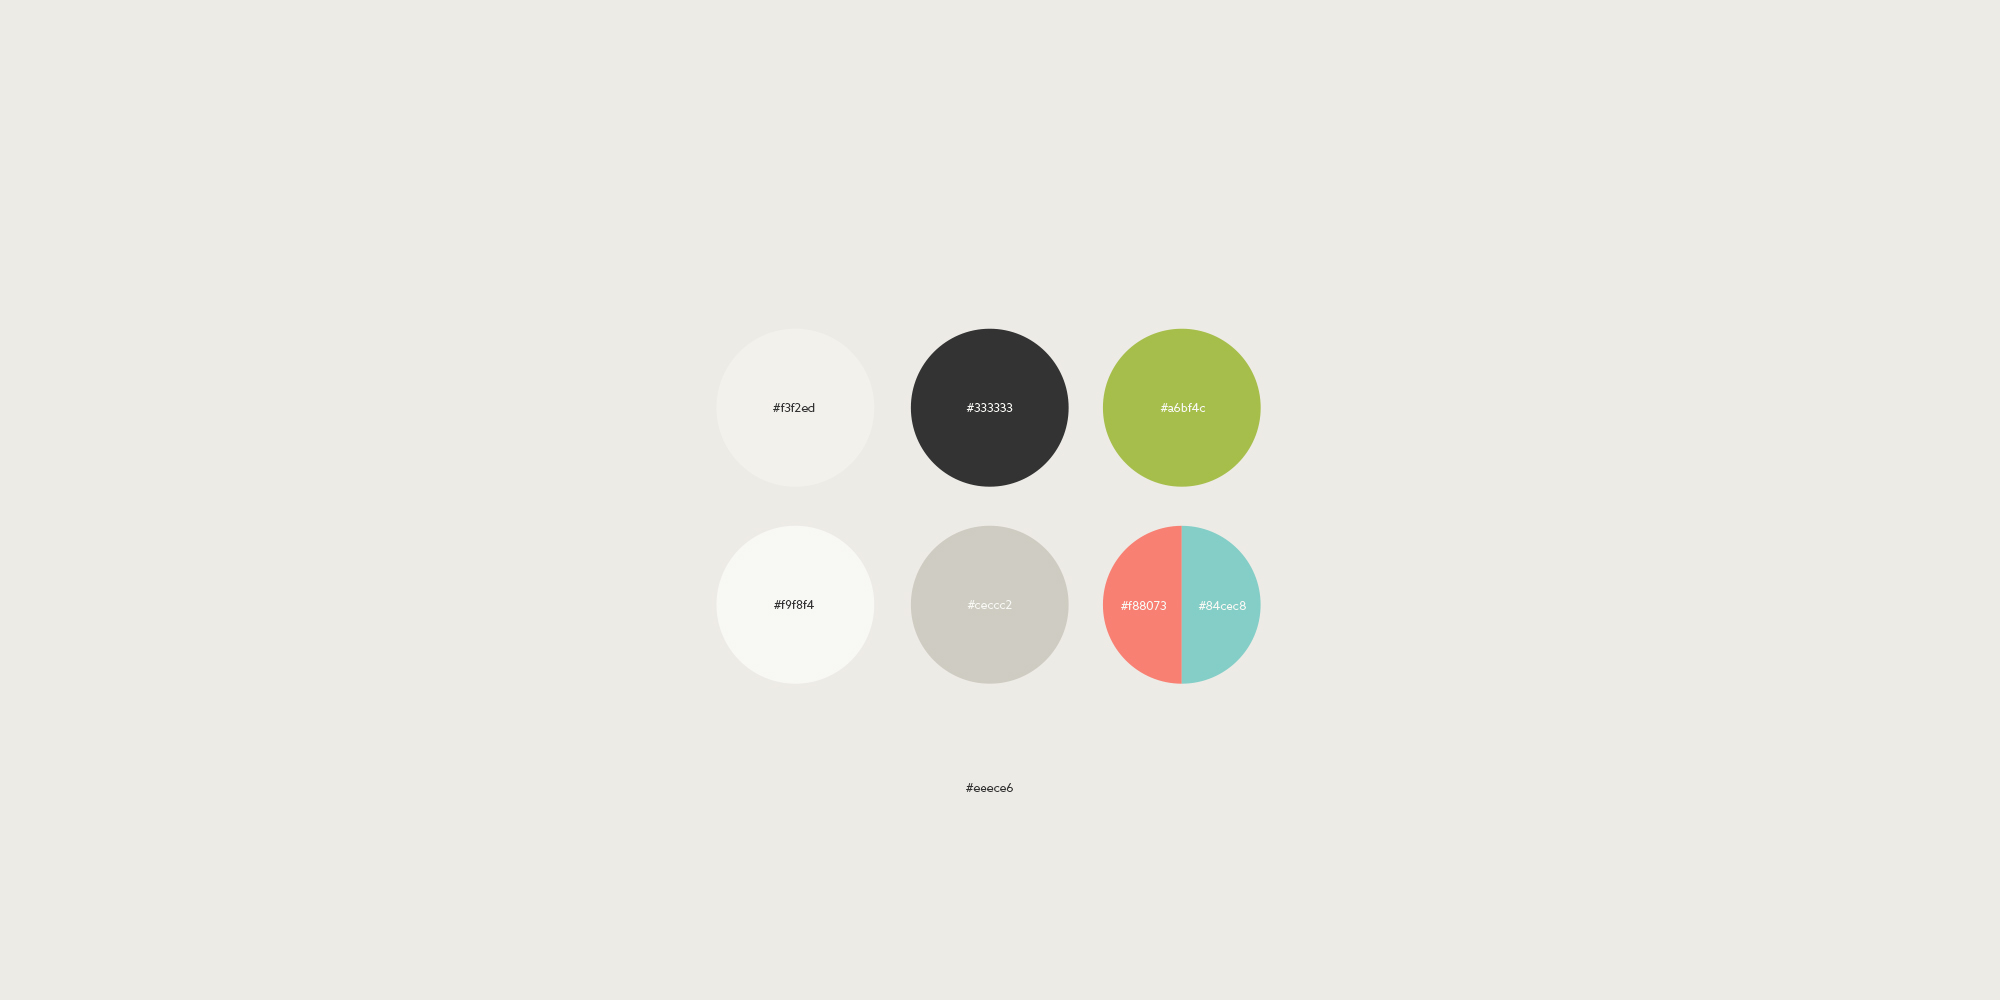 Native_brandidentity_websitedesign_julieeckertdesign_3.jpg